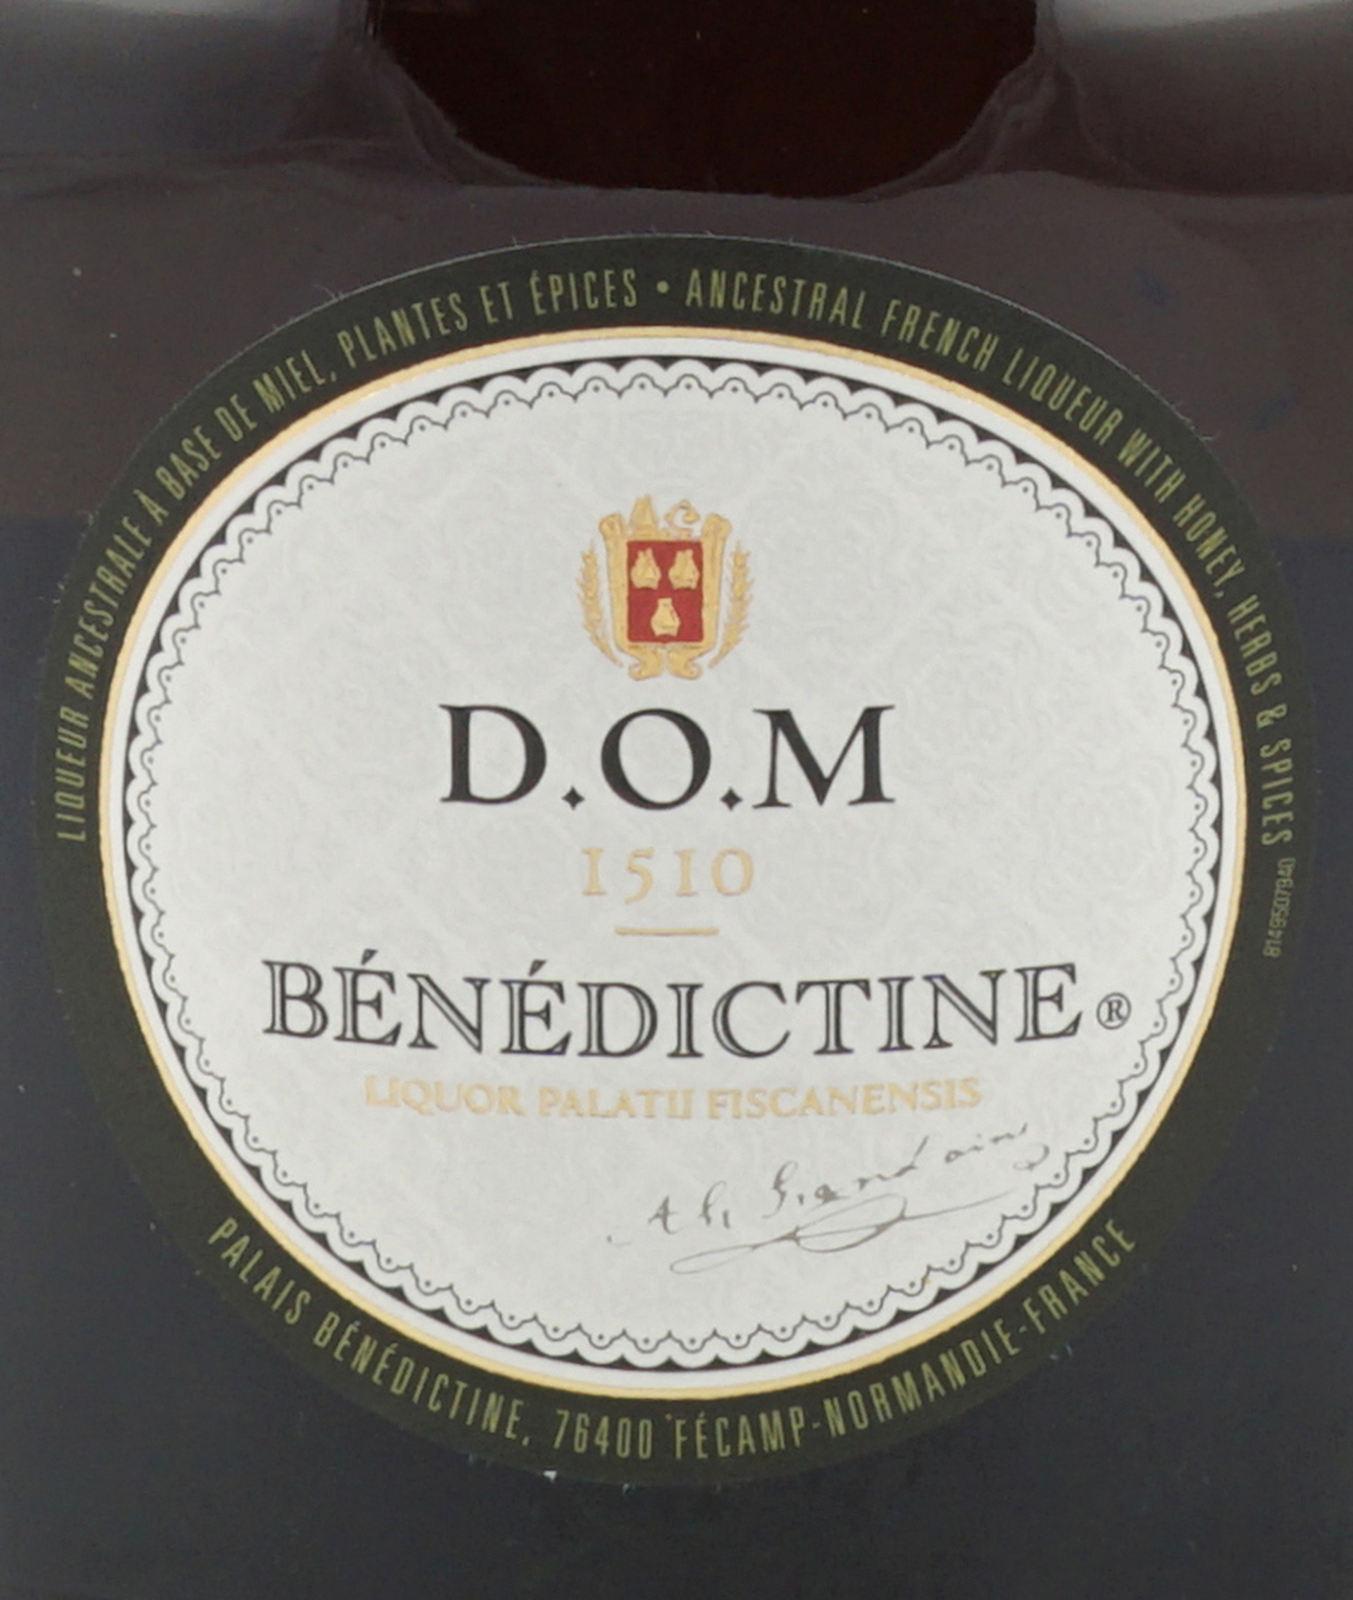 Benedictine D O M Likor 0 7 Liter 40 Vol Eur 17 00 Barfish